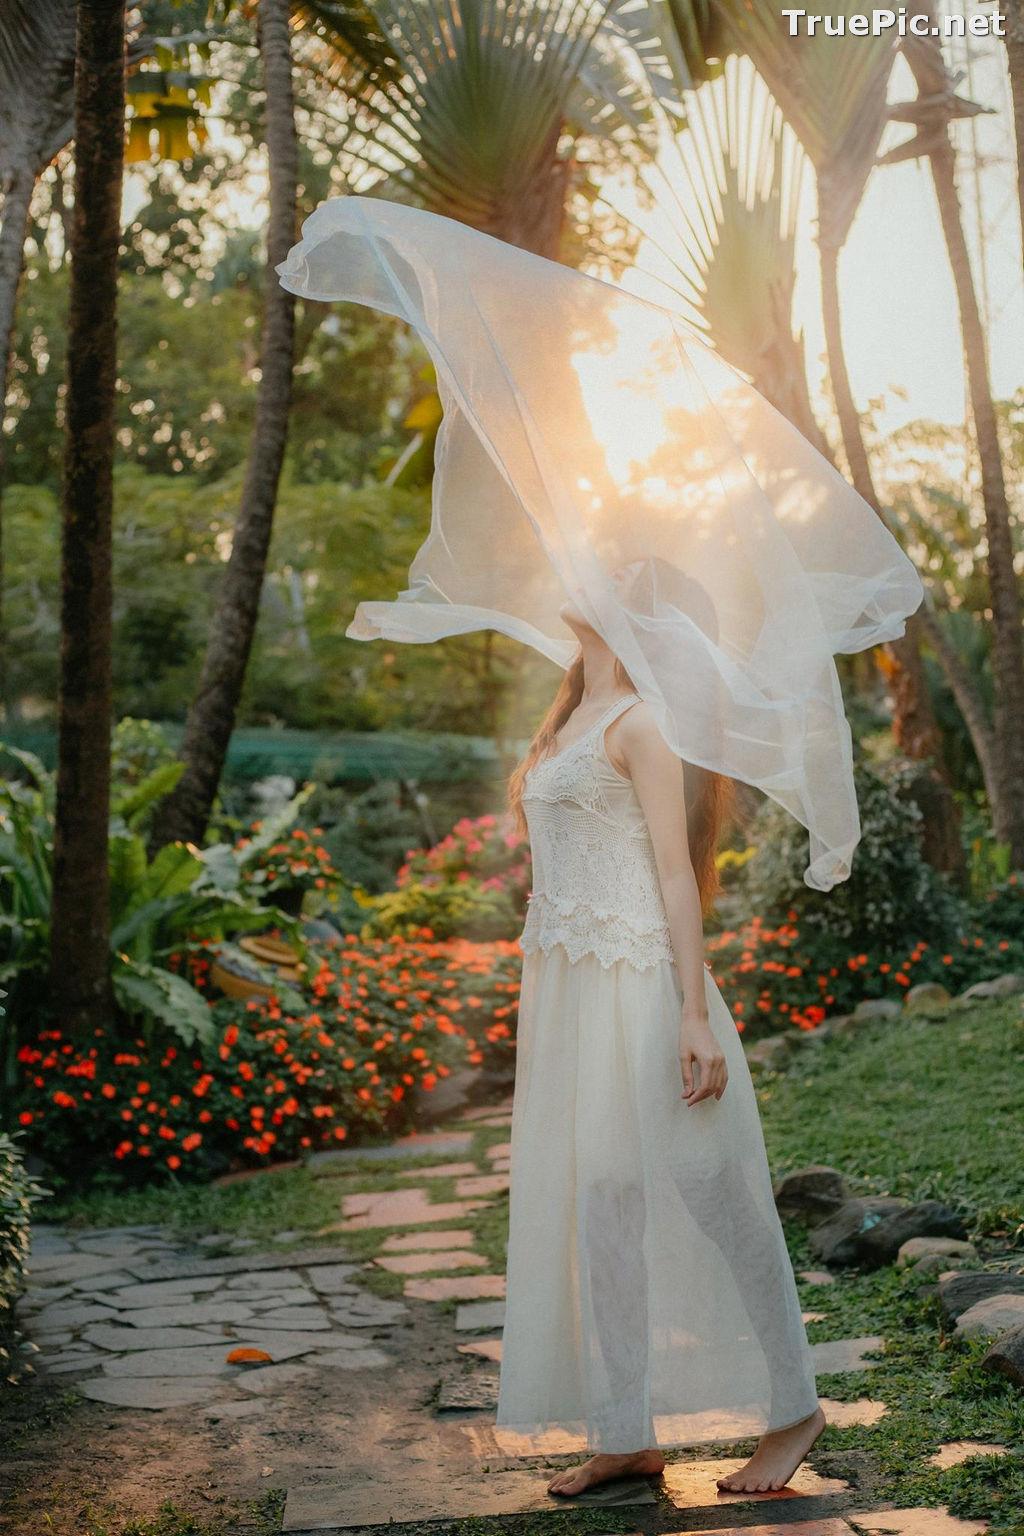 Image Vietnamese Model - Nguyen Phuong Dung - Hot Girls Ads - TruePic.net - Picture-9